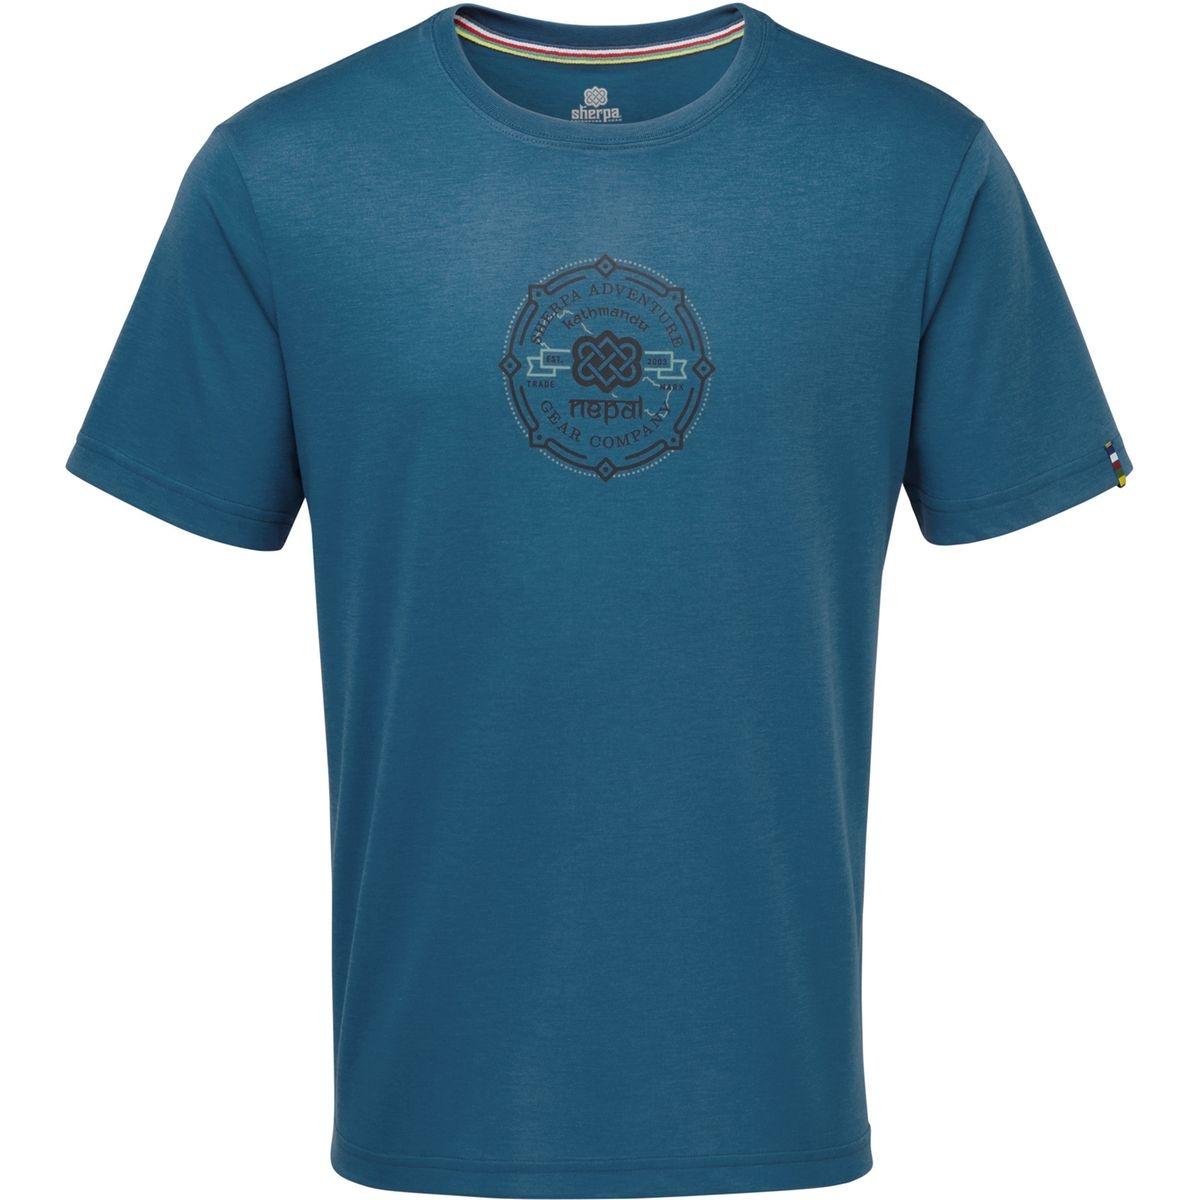 Kimti - T-shirt manches courtes Homme - bleu